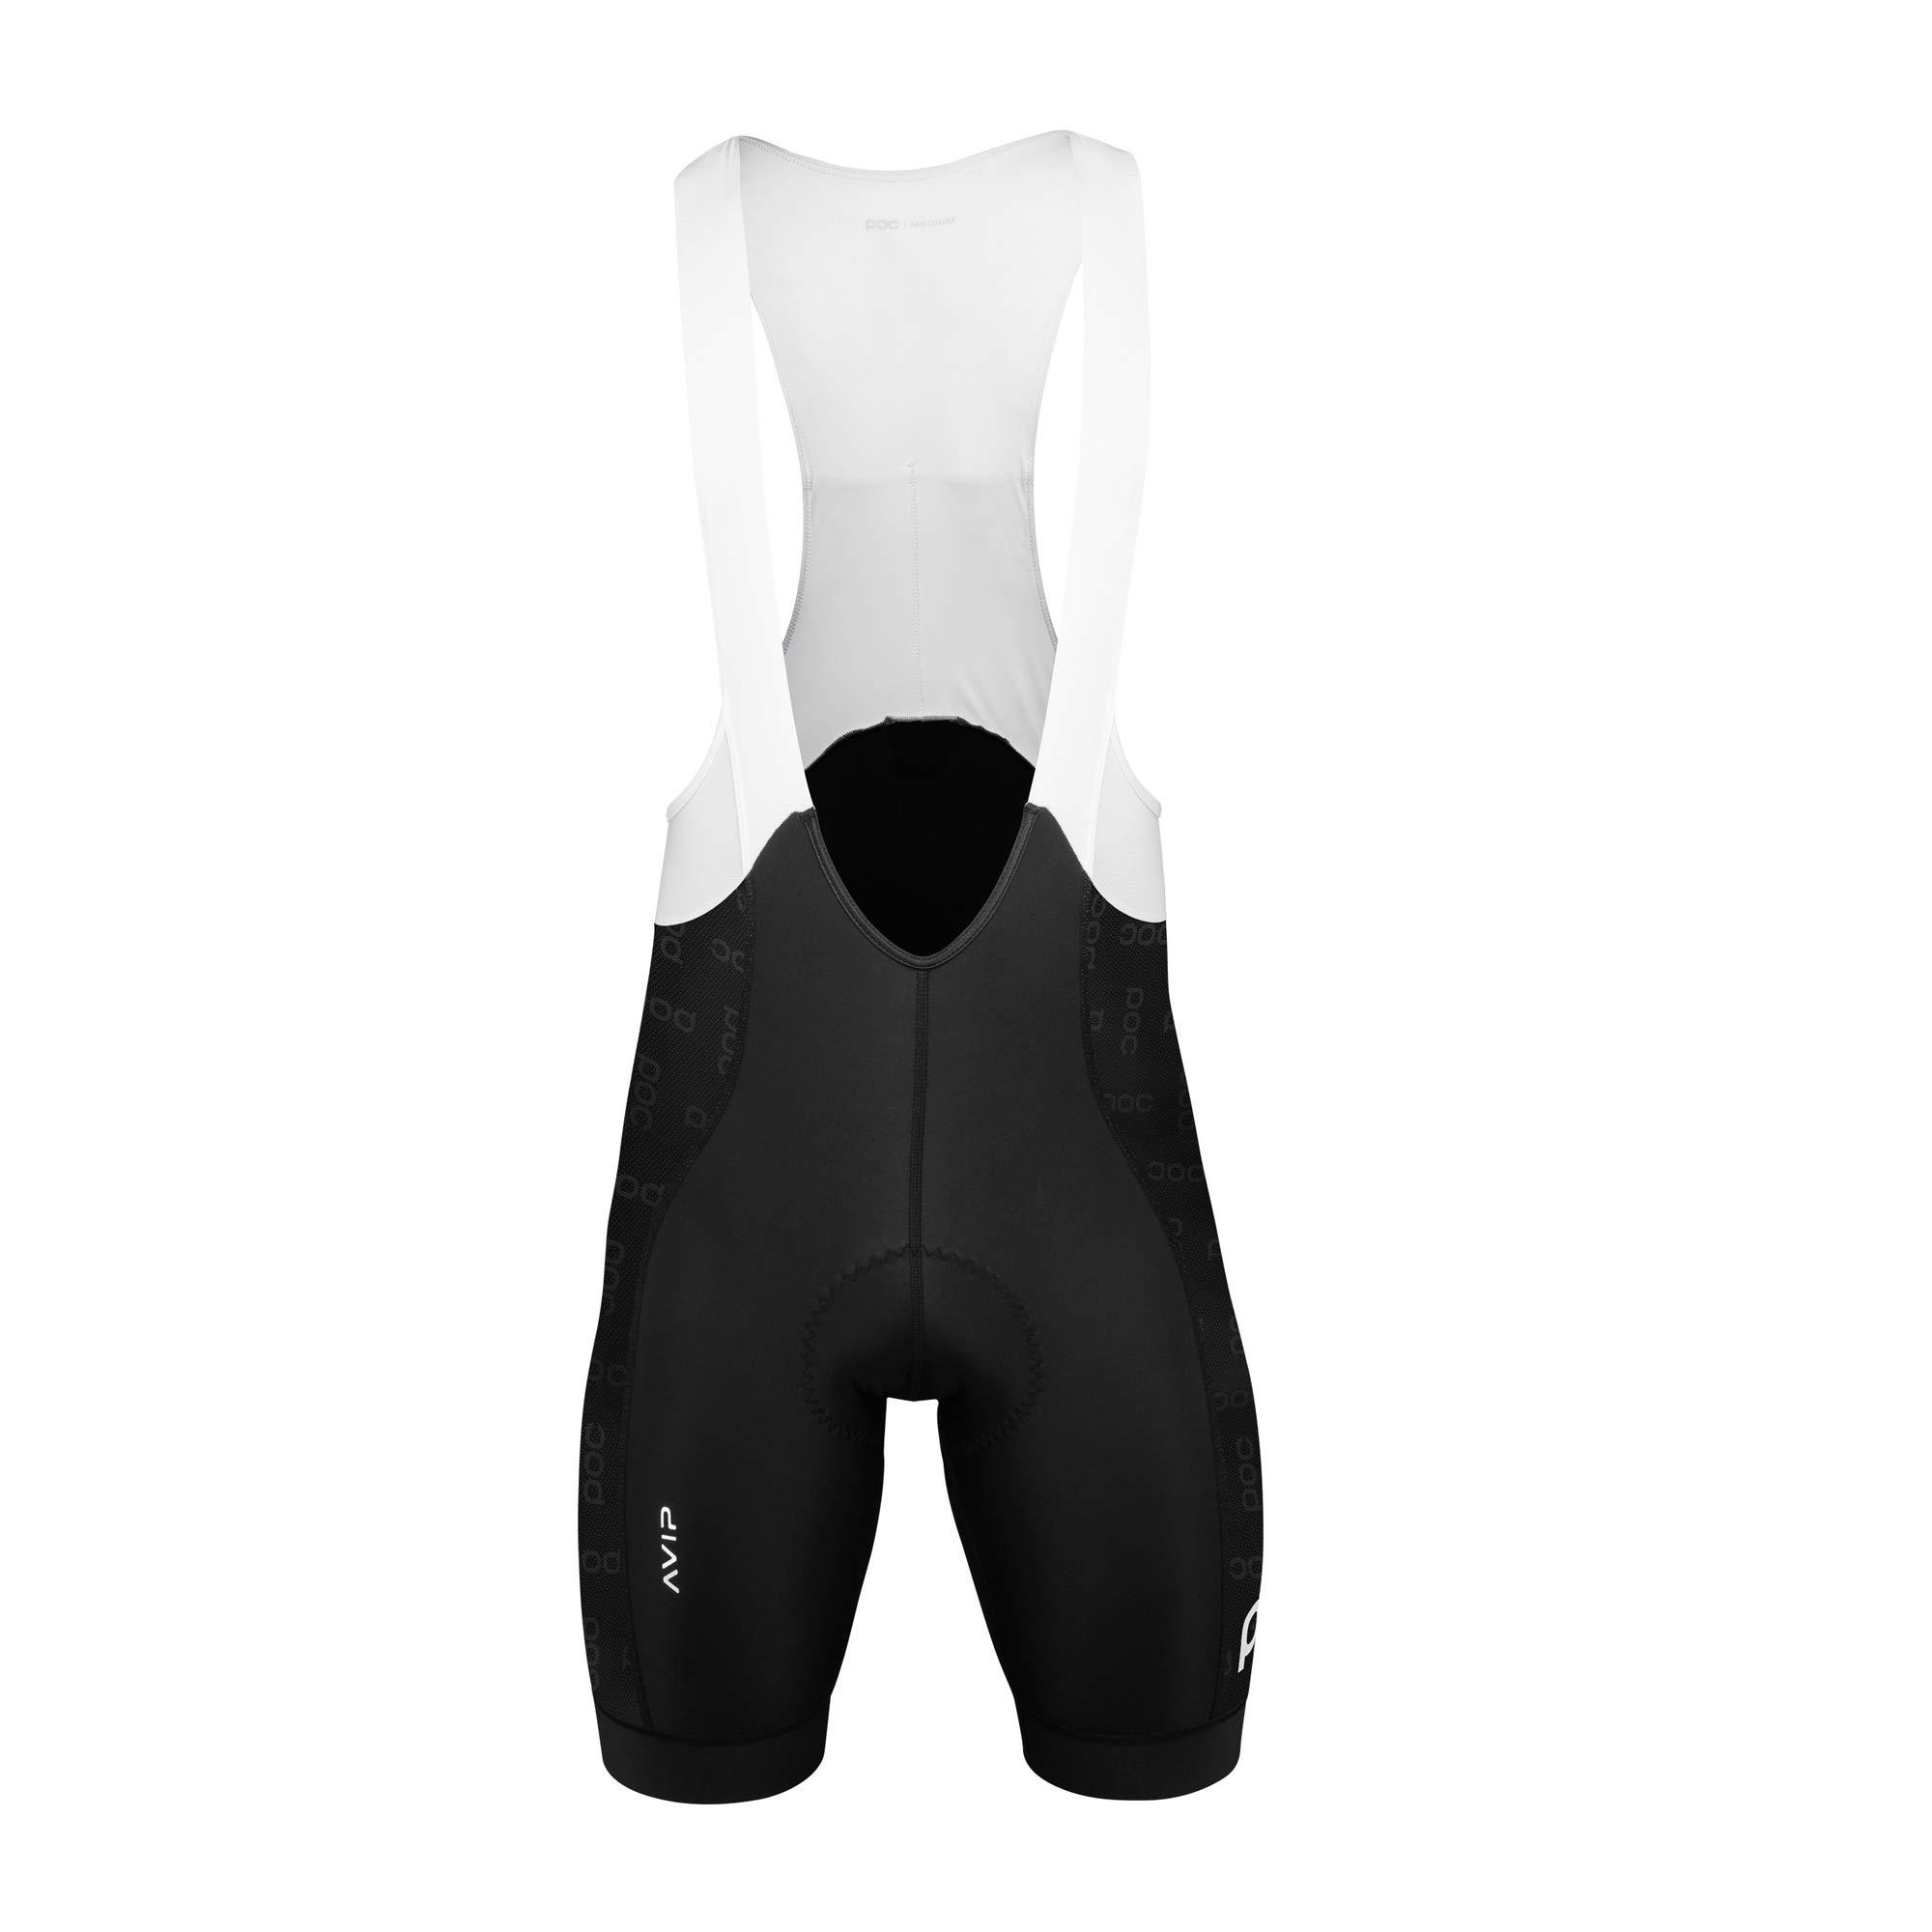 POC AVIP Ceramic VPDs Bib Shorts, Cycling Apparel, Uranium Black, XS